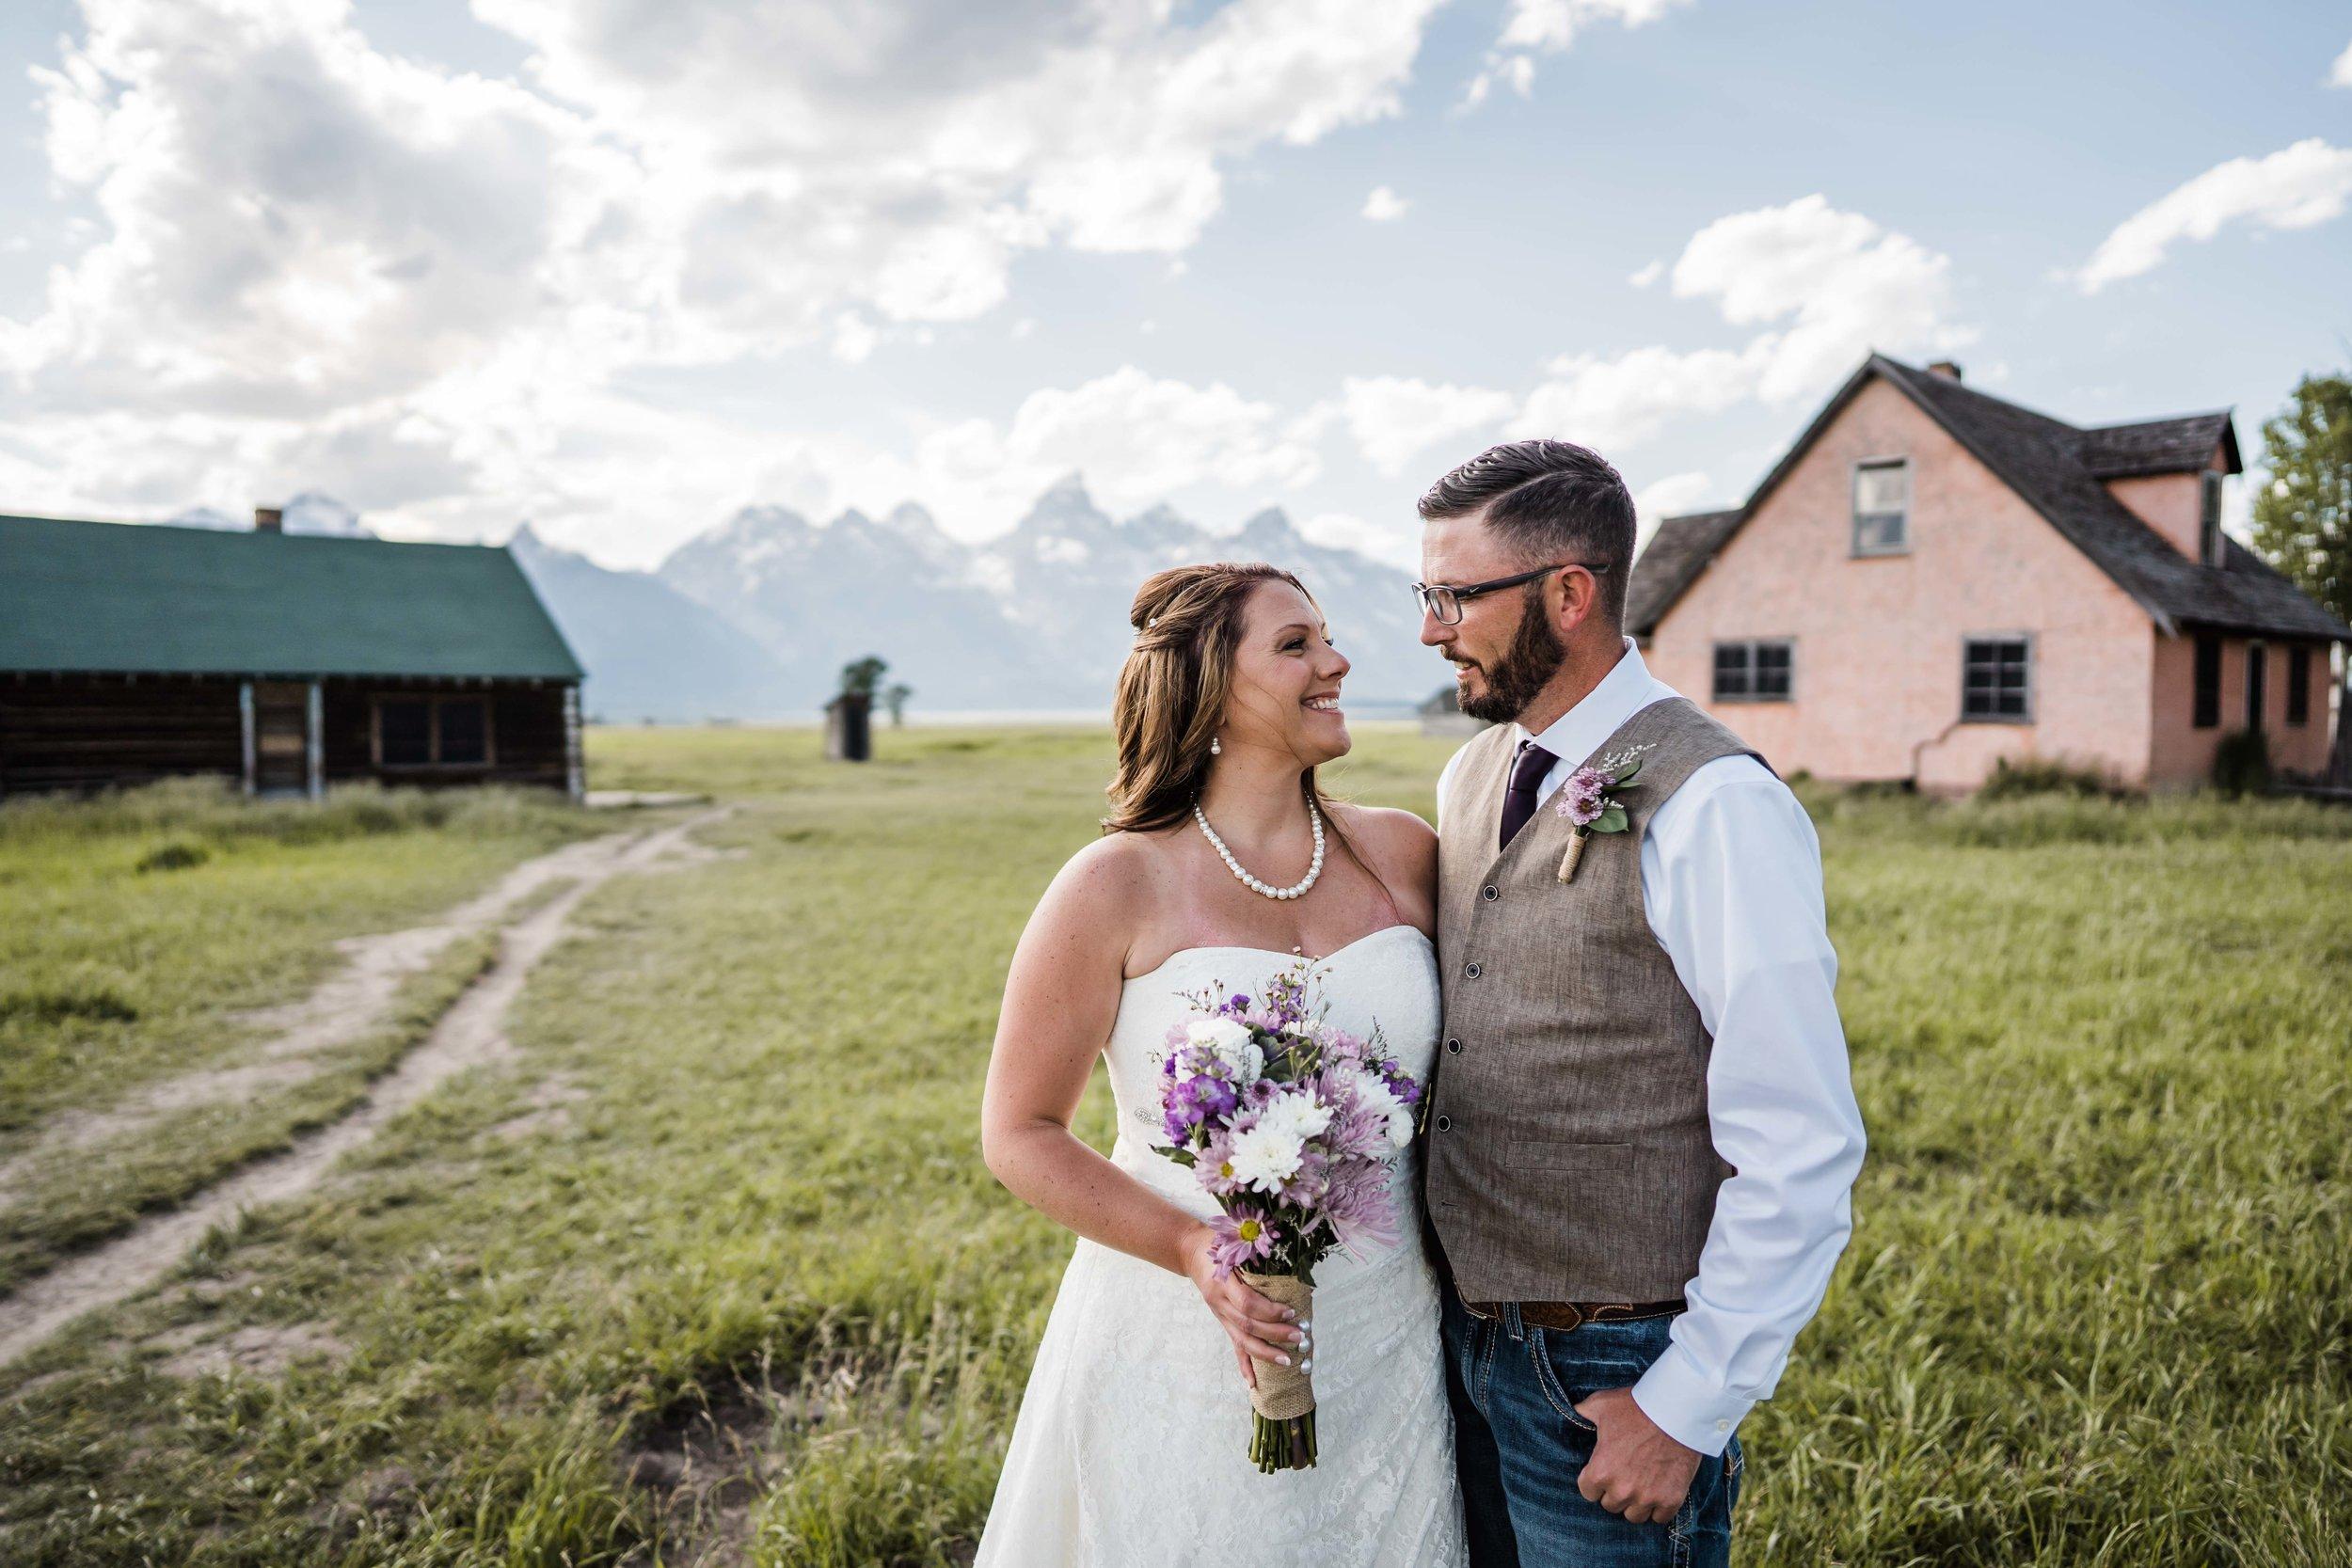 jackson hole adventure wedding photography at schwabachers landing in GTNP -DSD01240.jpg